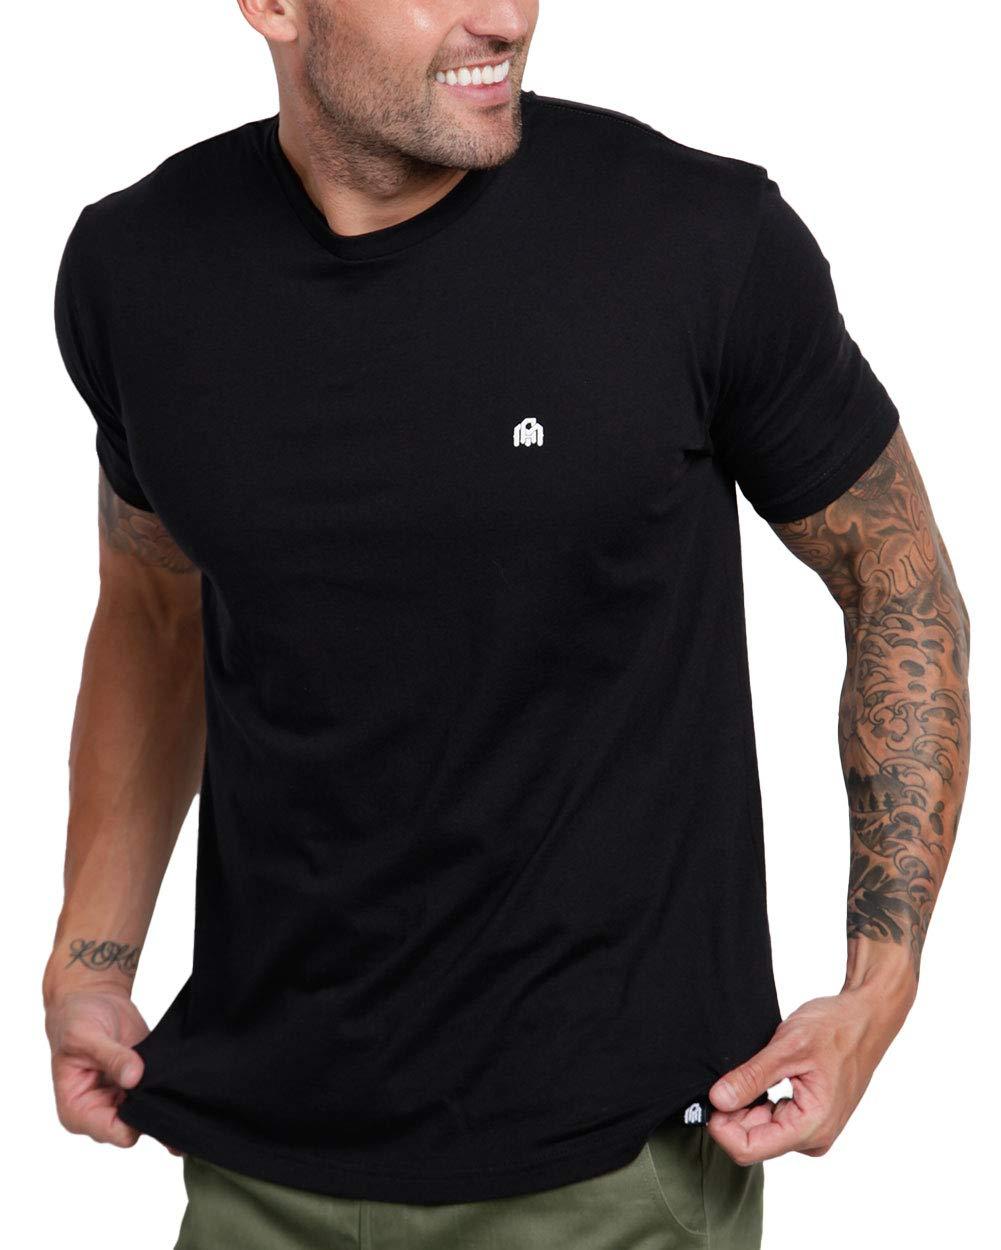 INTO THE AM Men's T-Shirts - Premium Short Sleeve Casual Crew Neck Tee Shirt